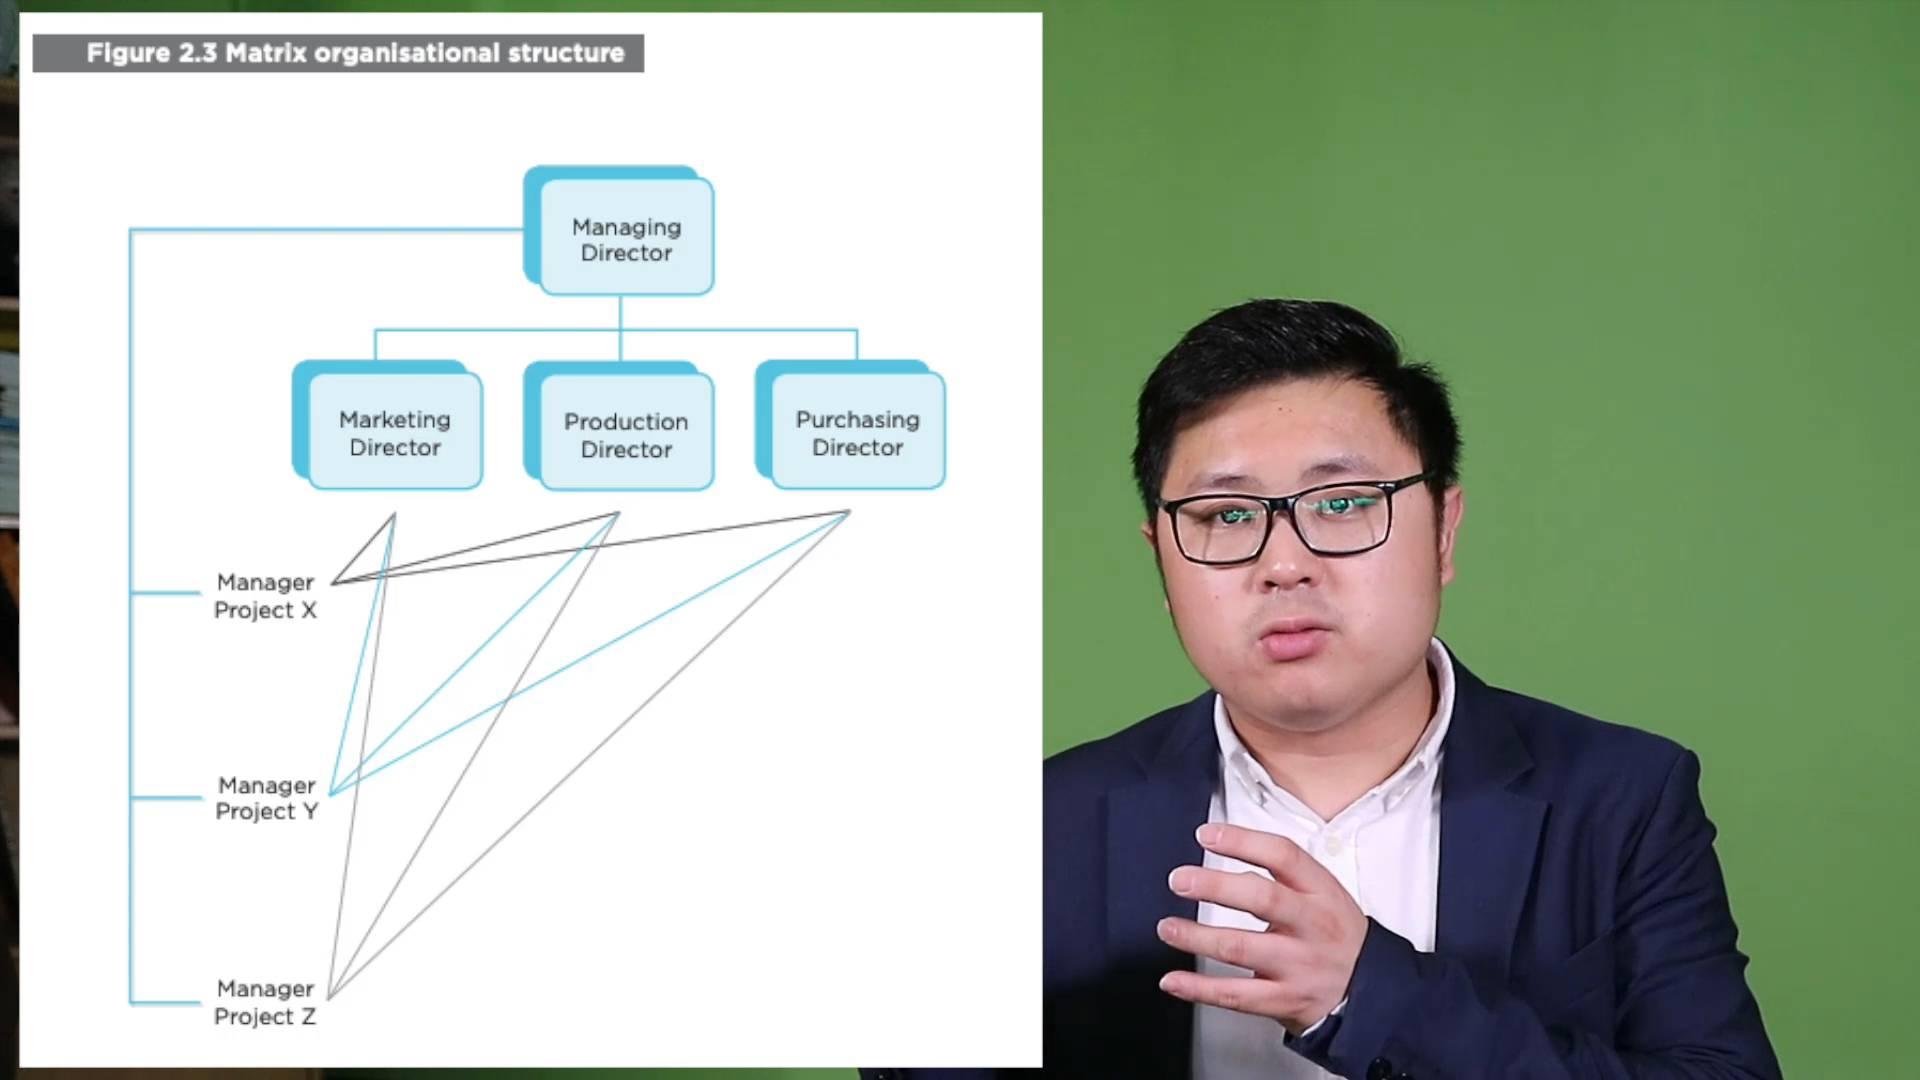 3. organizational structure - EBM (Toe Tet)